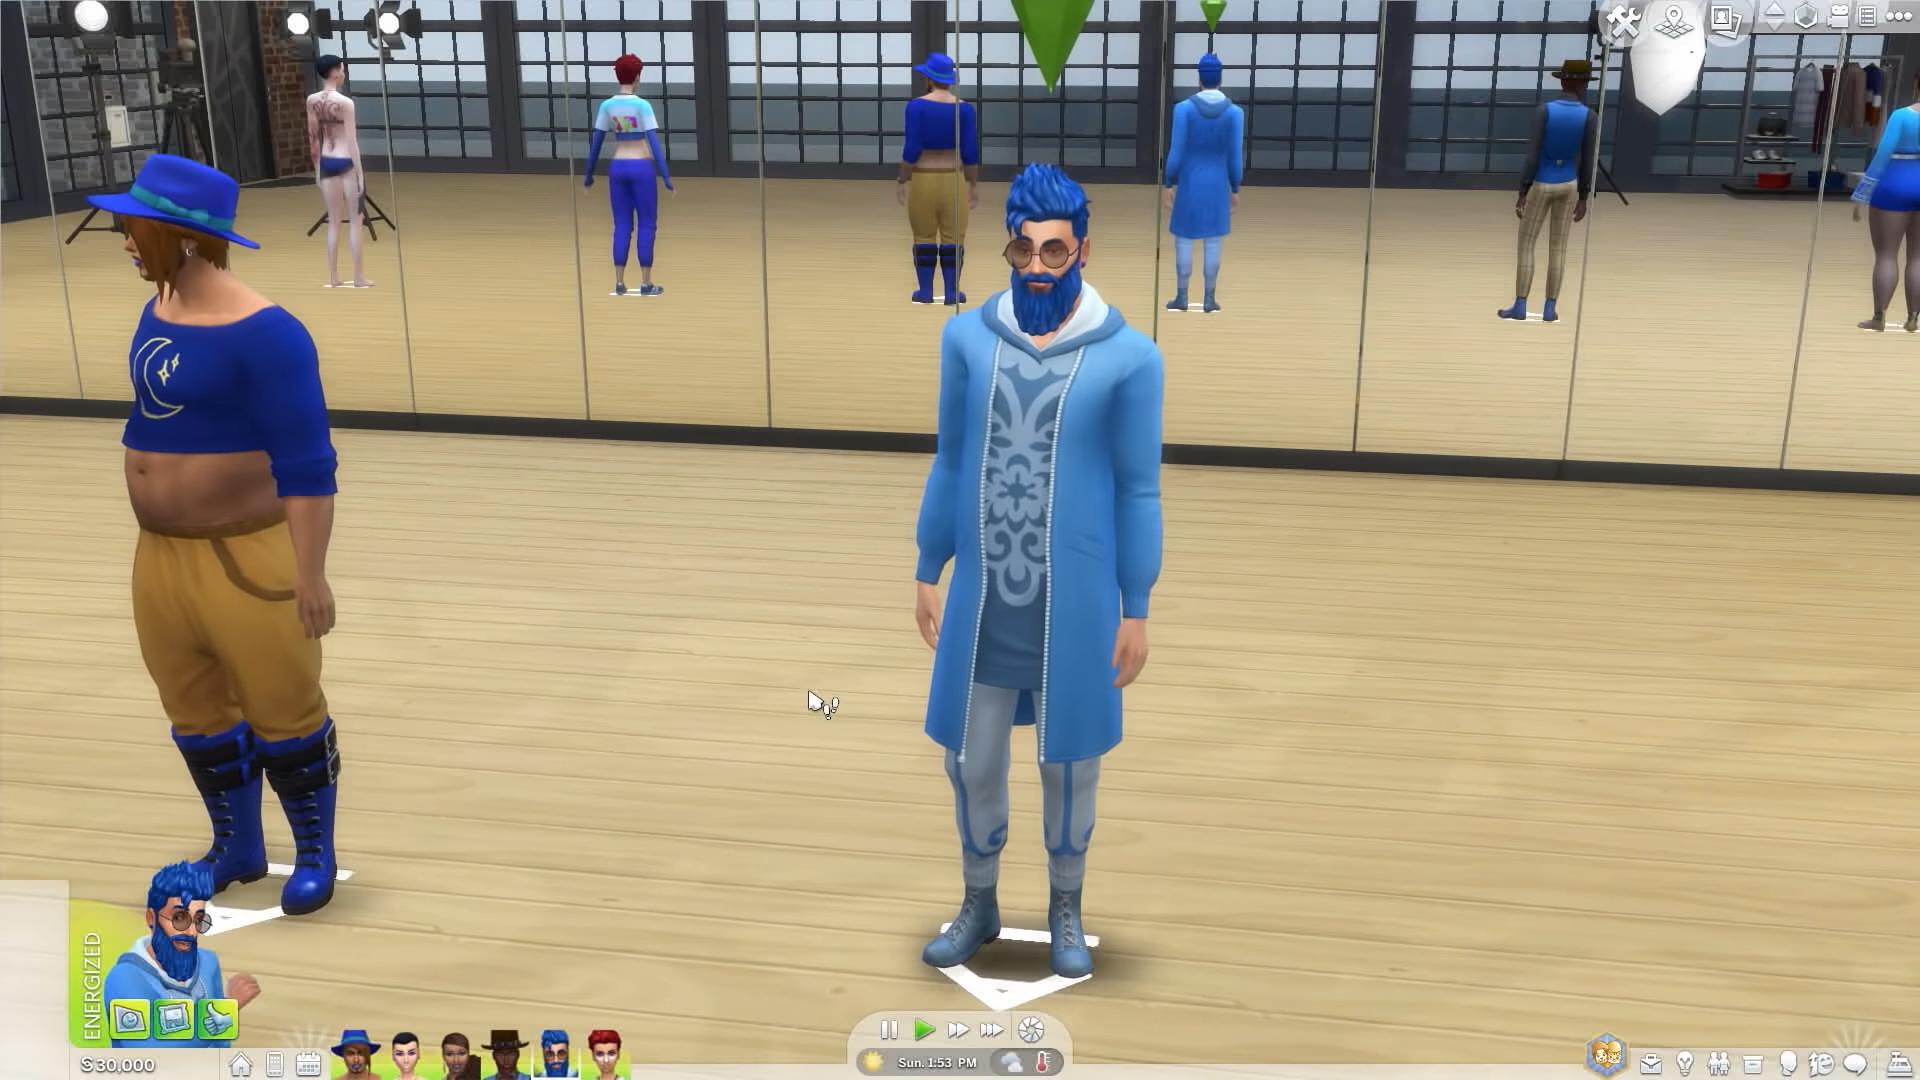 Les Sims Spark'd Screenshot-2020-08-03-174035